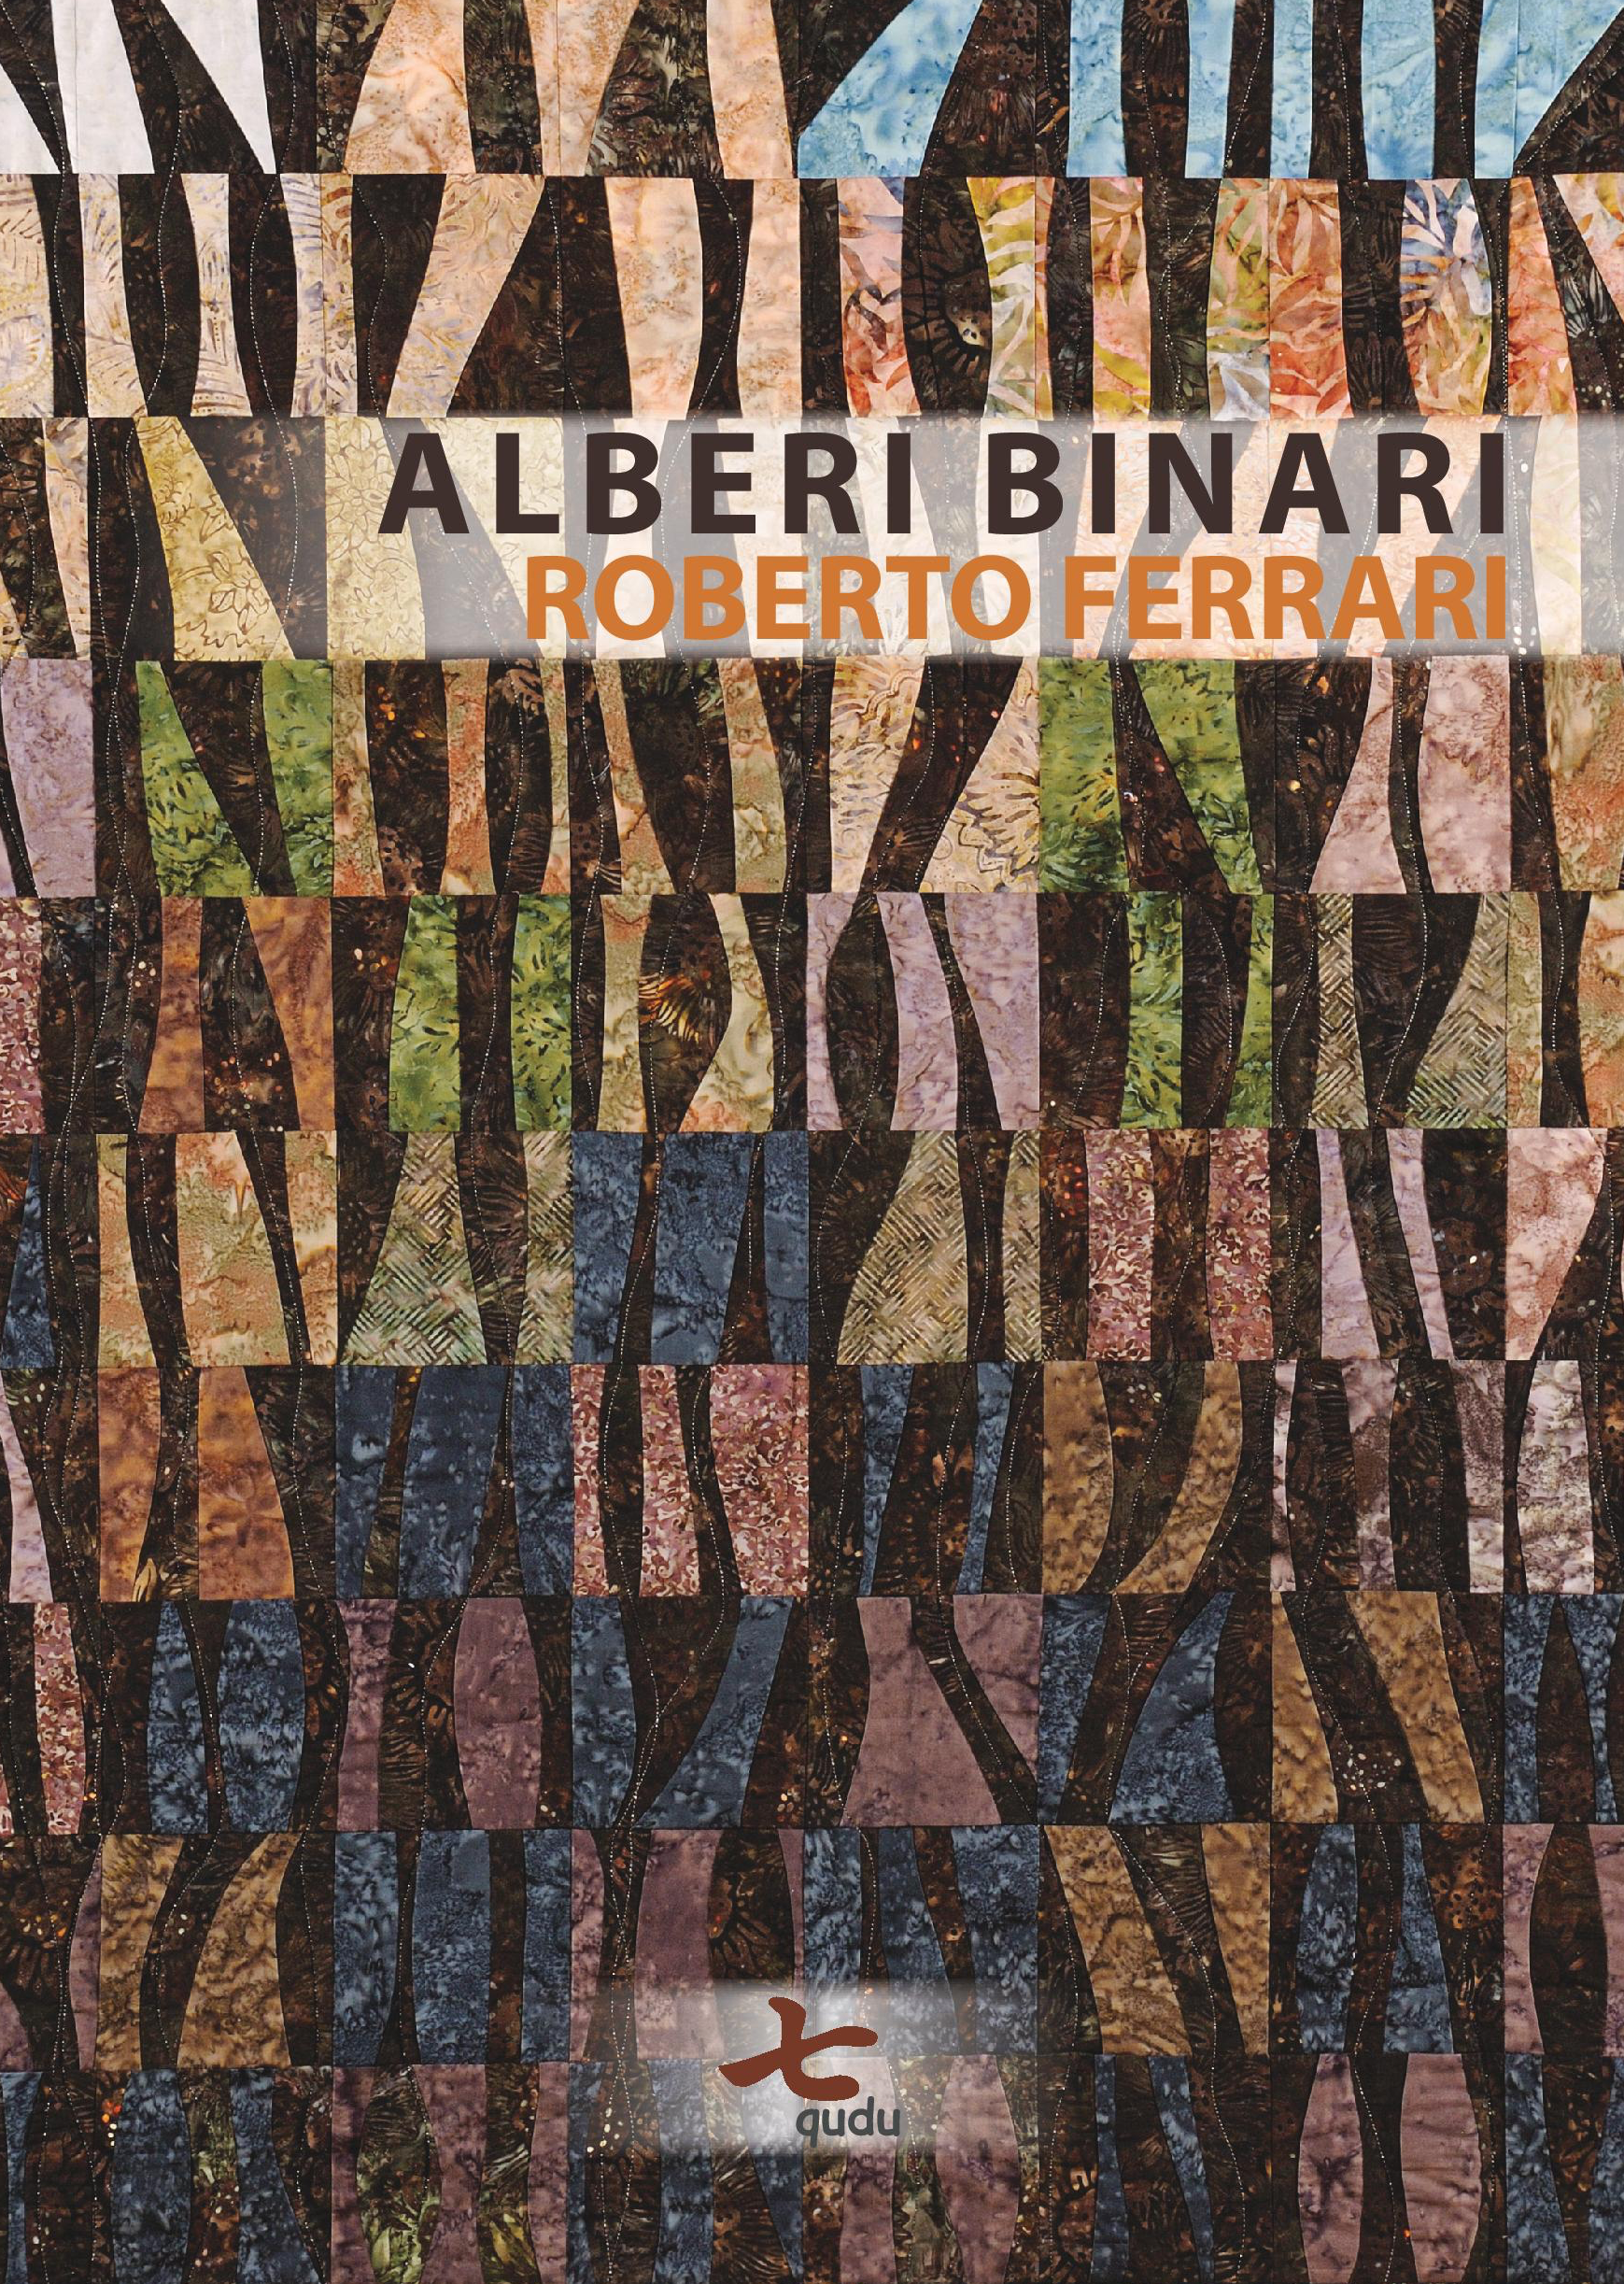 Alberi binari – Roberto Ferrari